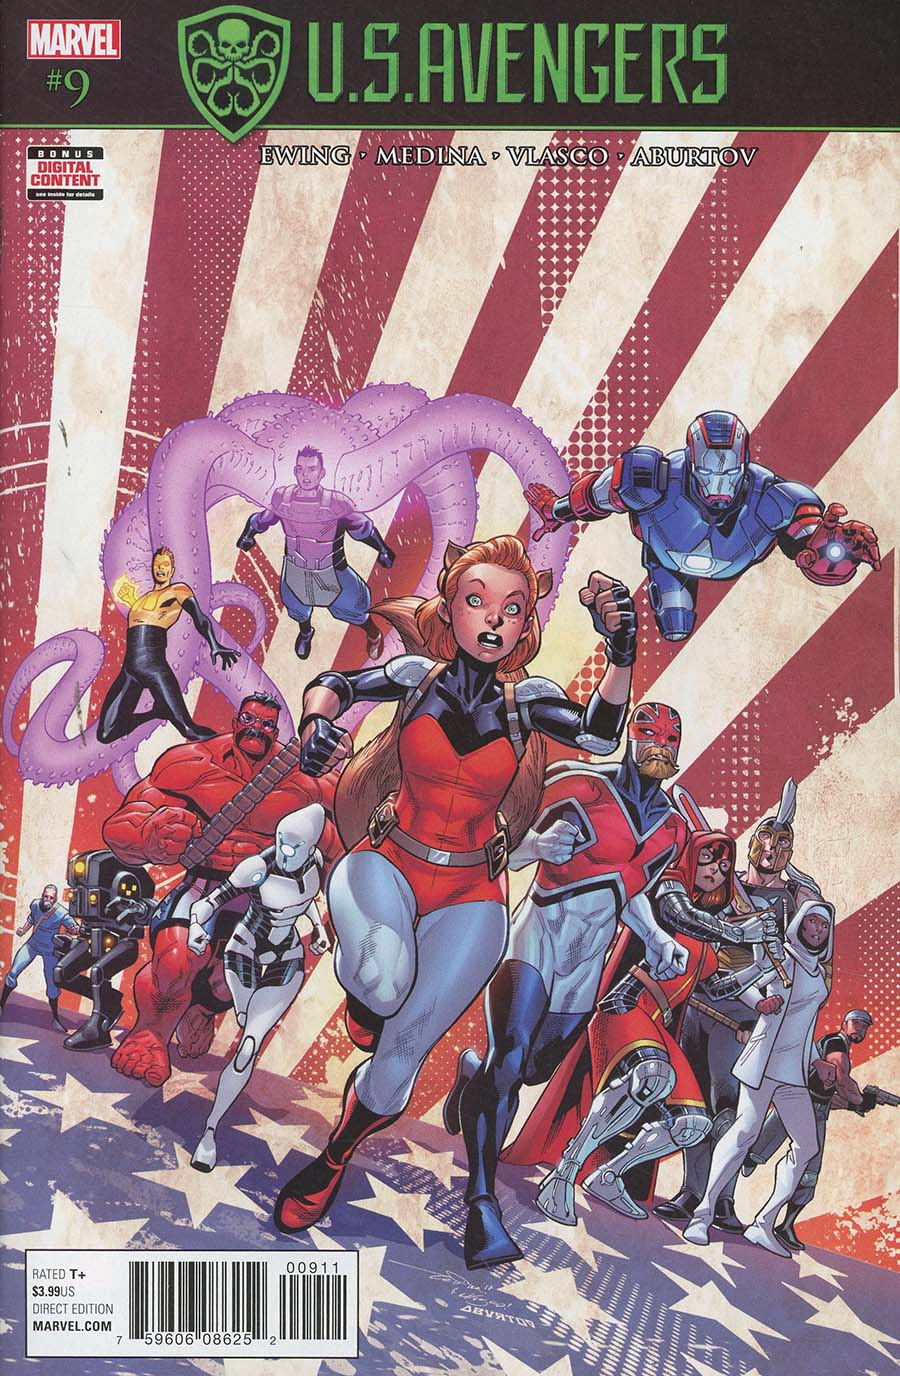 U.S.Avengers #9 (Secret Empire Tie-In)